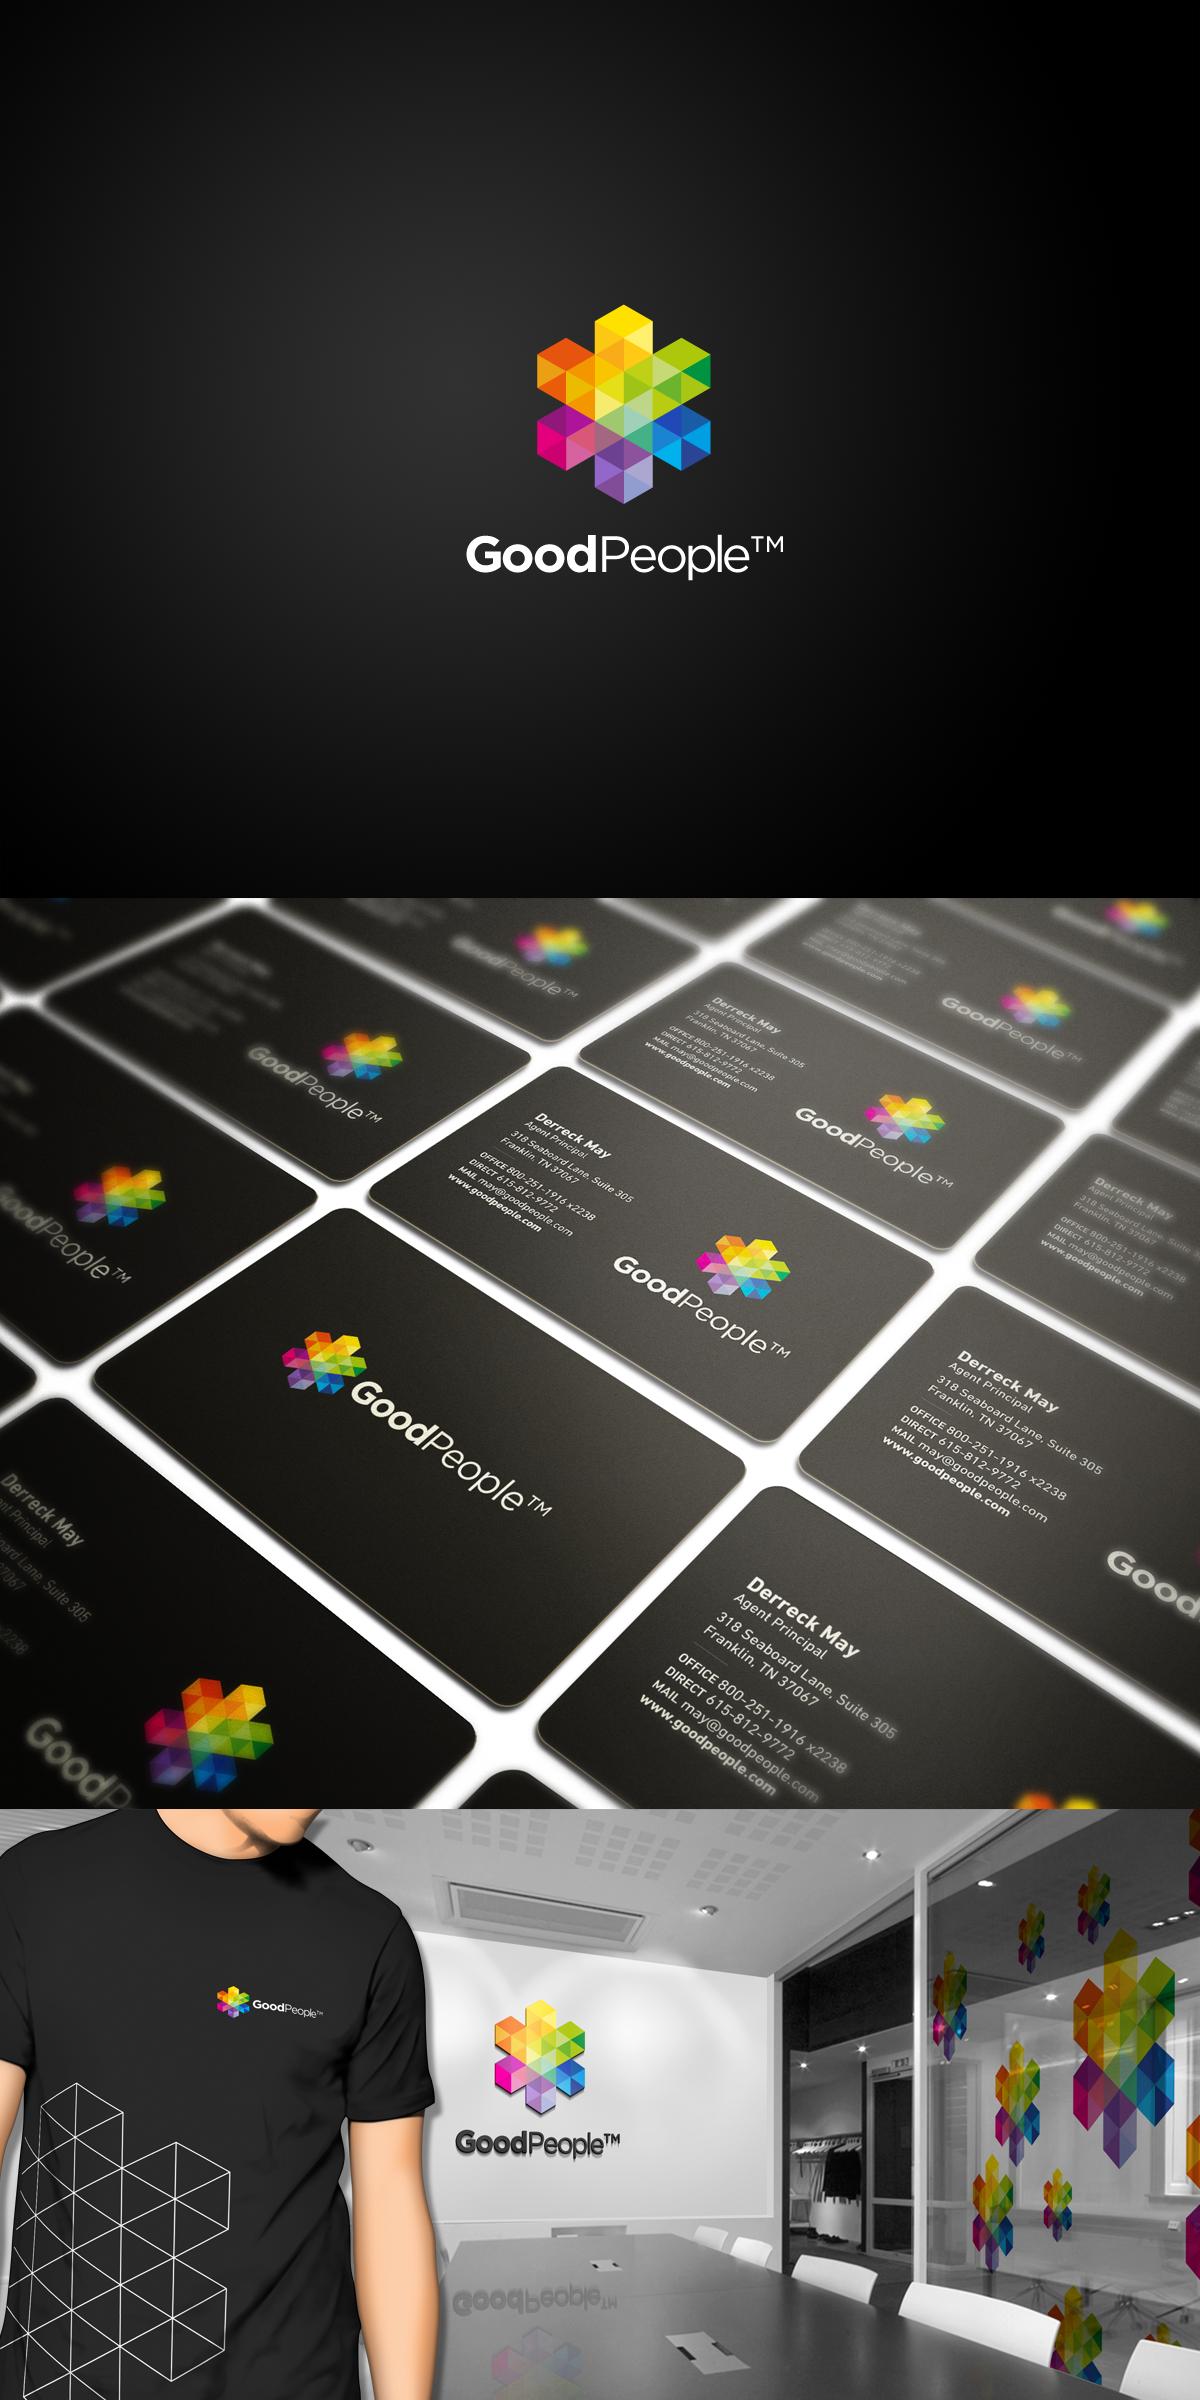 Company Identity Design For Multi Level Marketing Mlm Company Brand Identity Pack Design 122 By Dotdot